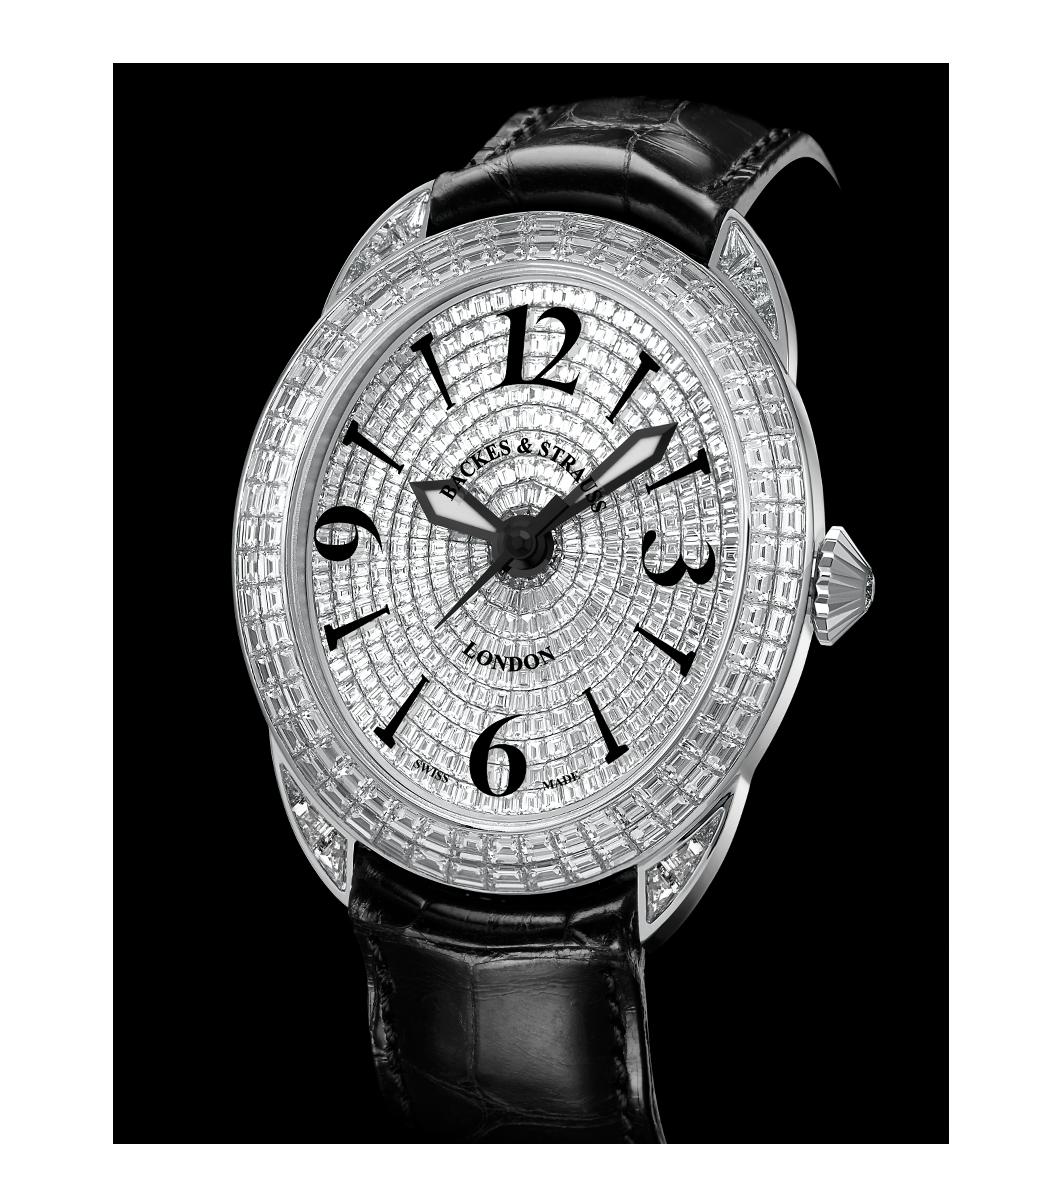 Regent Prince 4452 iconic diamond encrusted watchRegent Prince 4452 iconic diamond encrusted watch